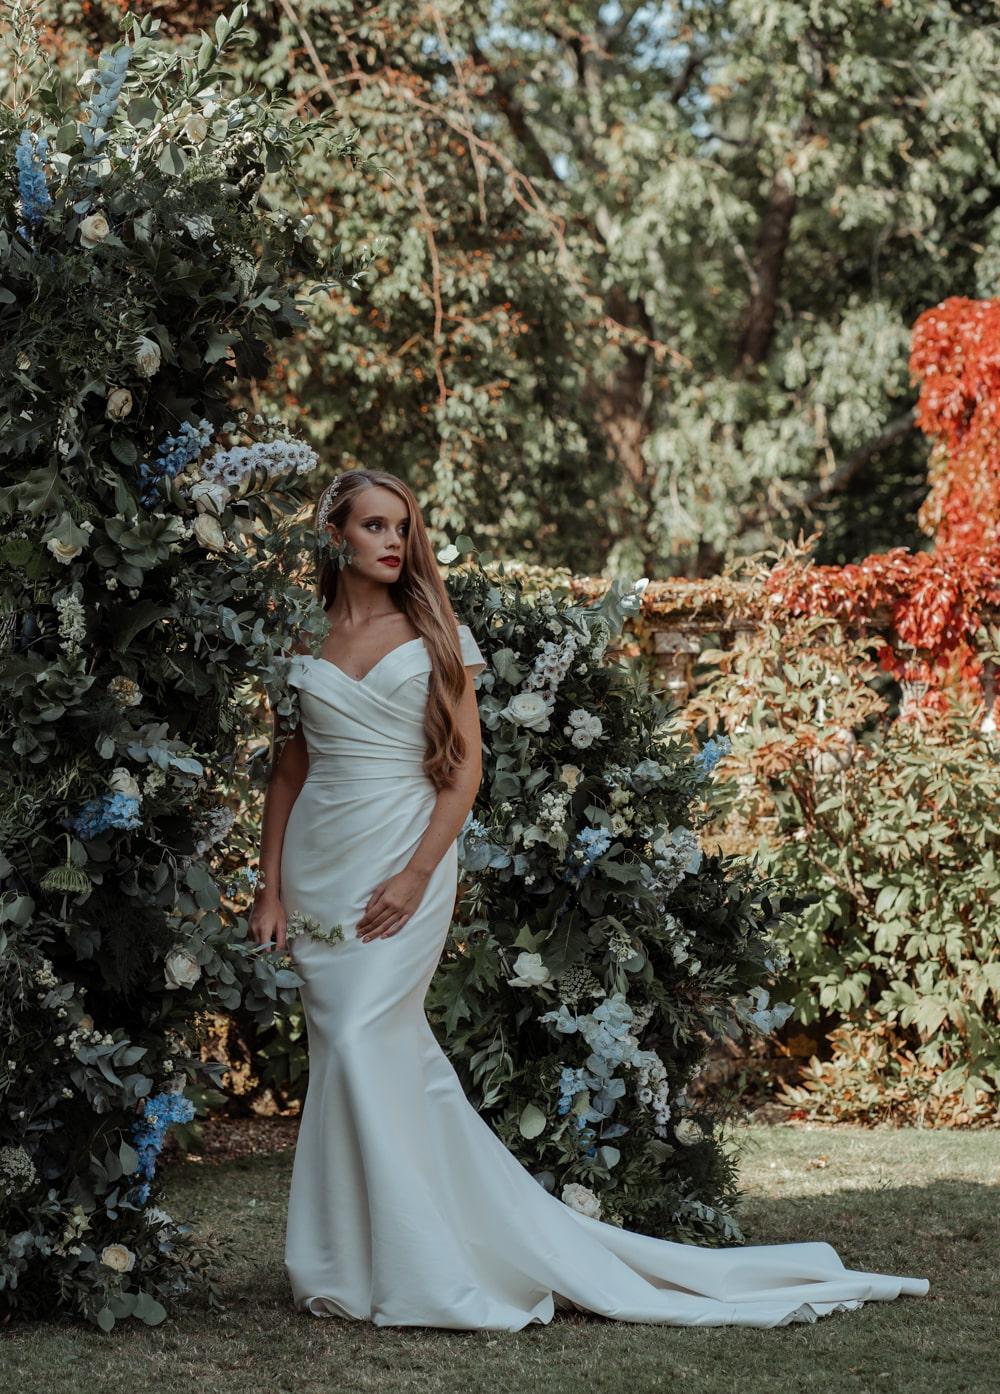 Open flower arch and bride in Enzoani Marla dress